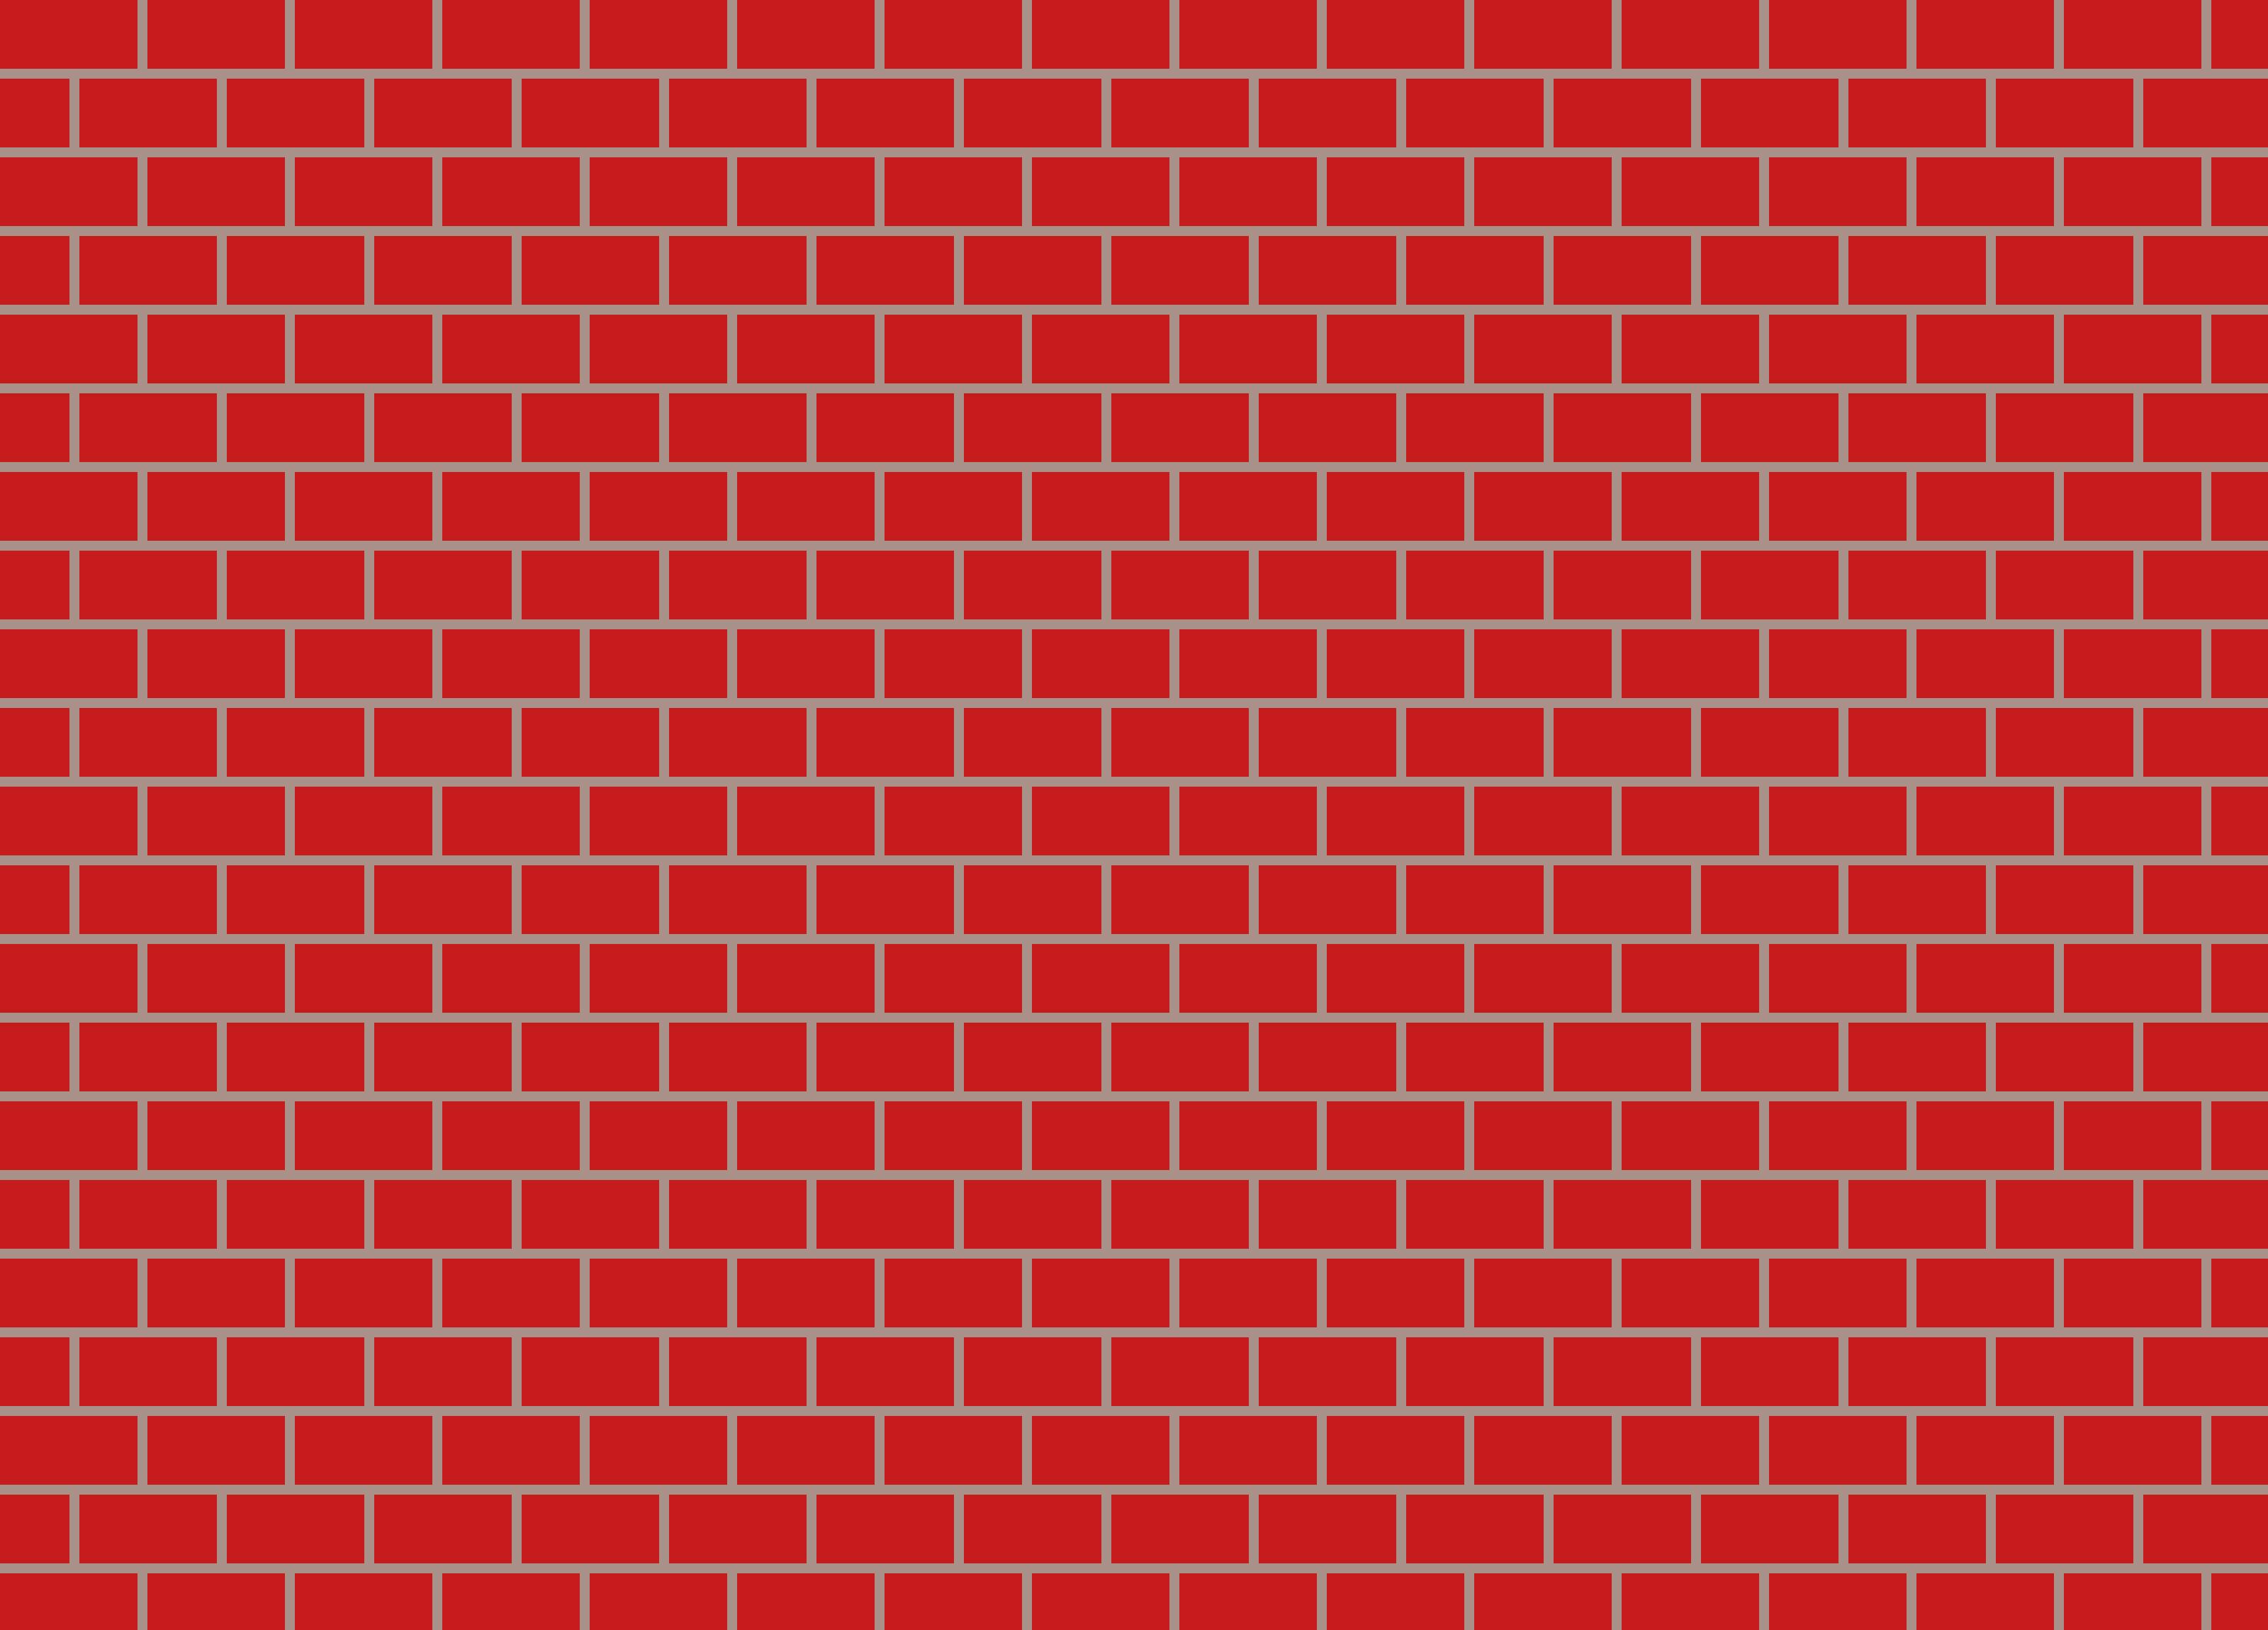 Brick clipart brick wall background Clipart Wall Wall #19 Download